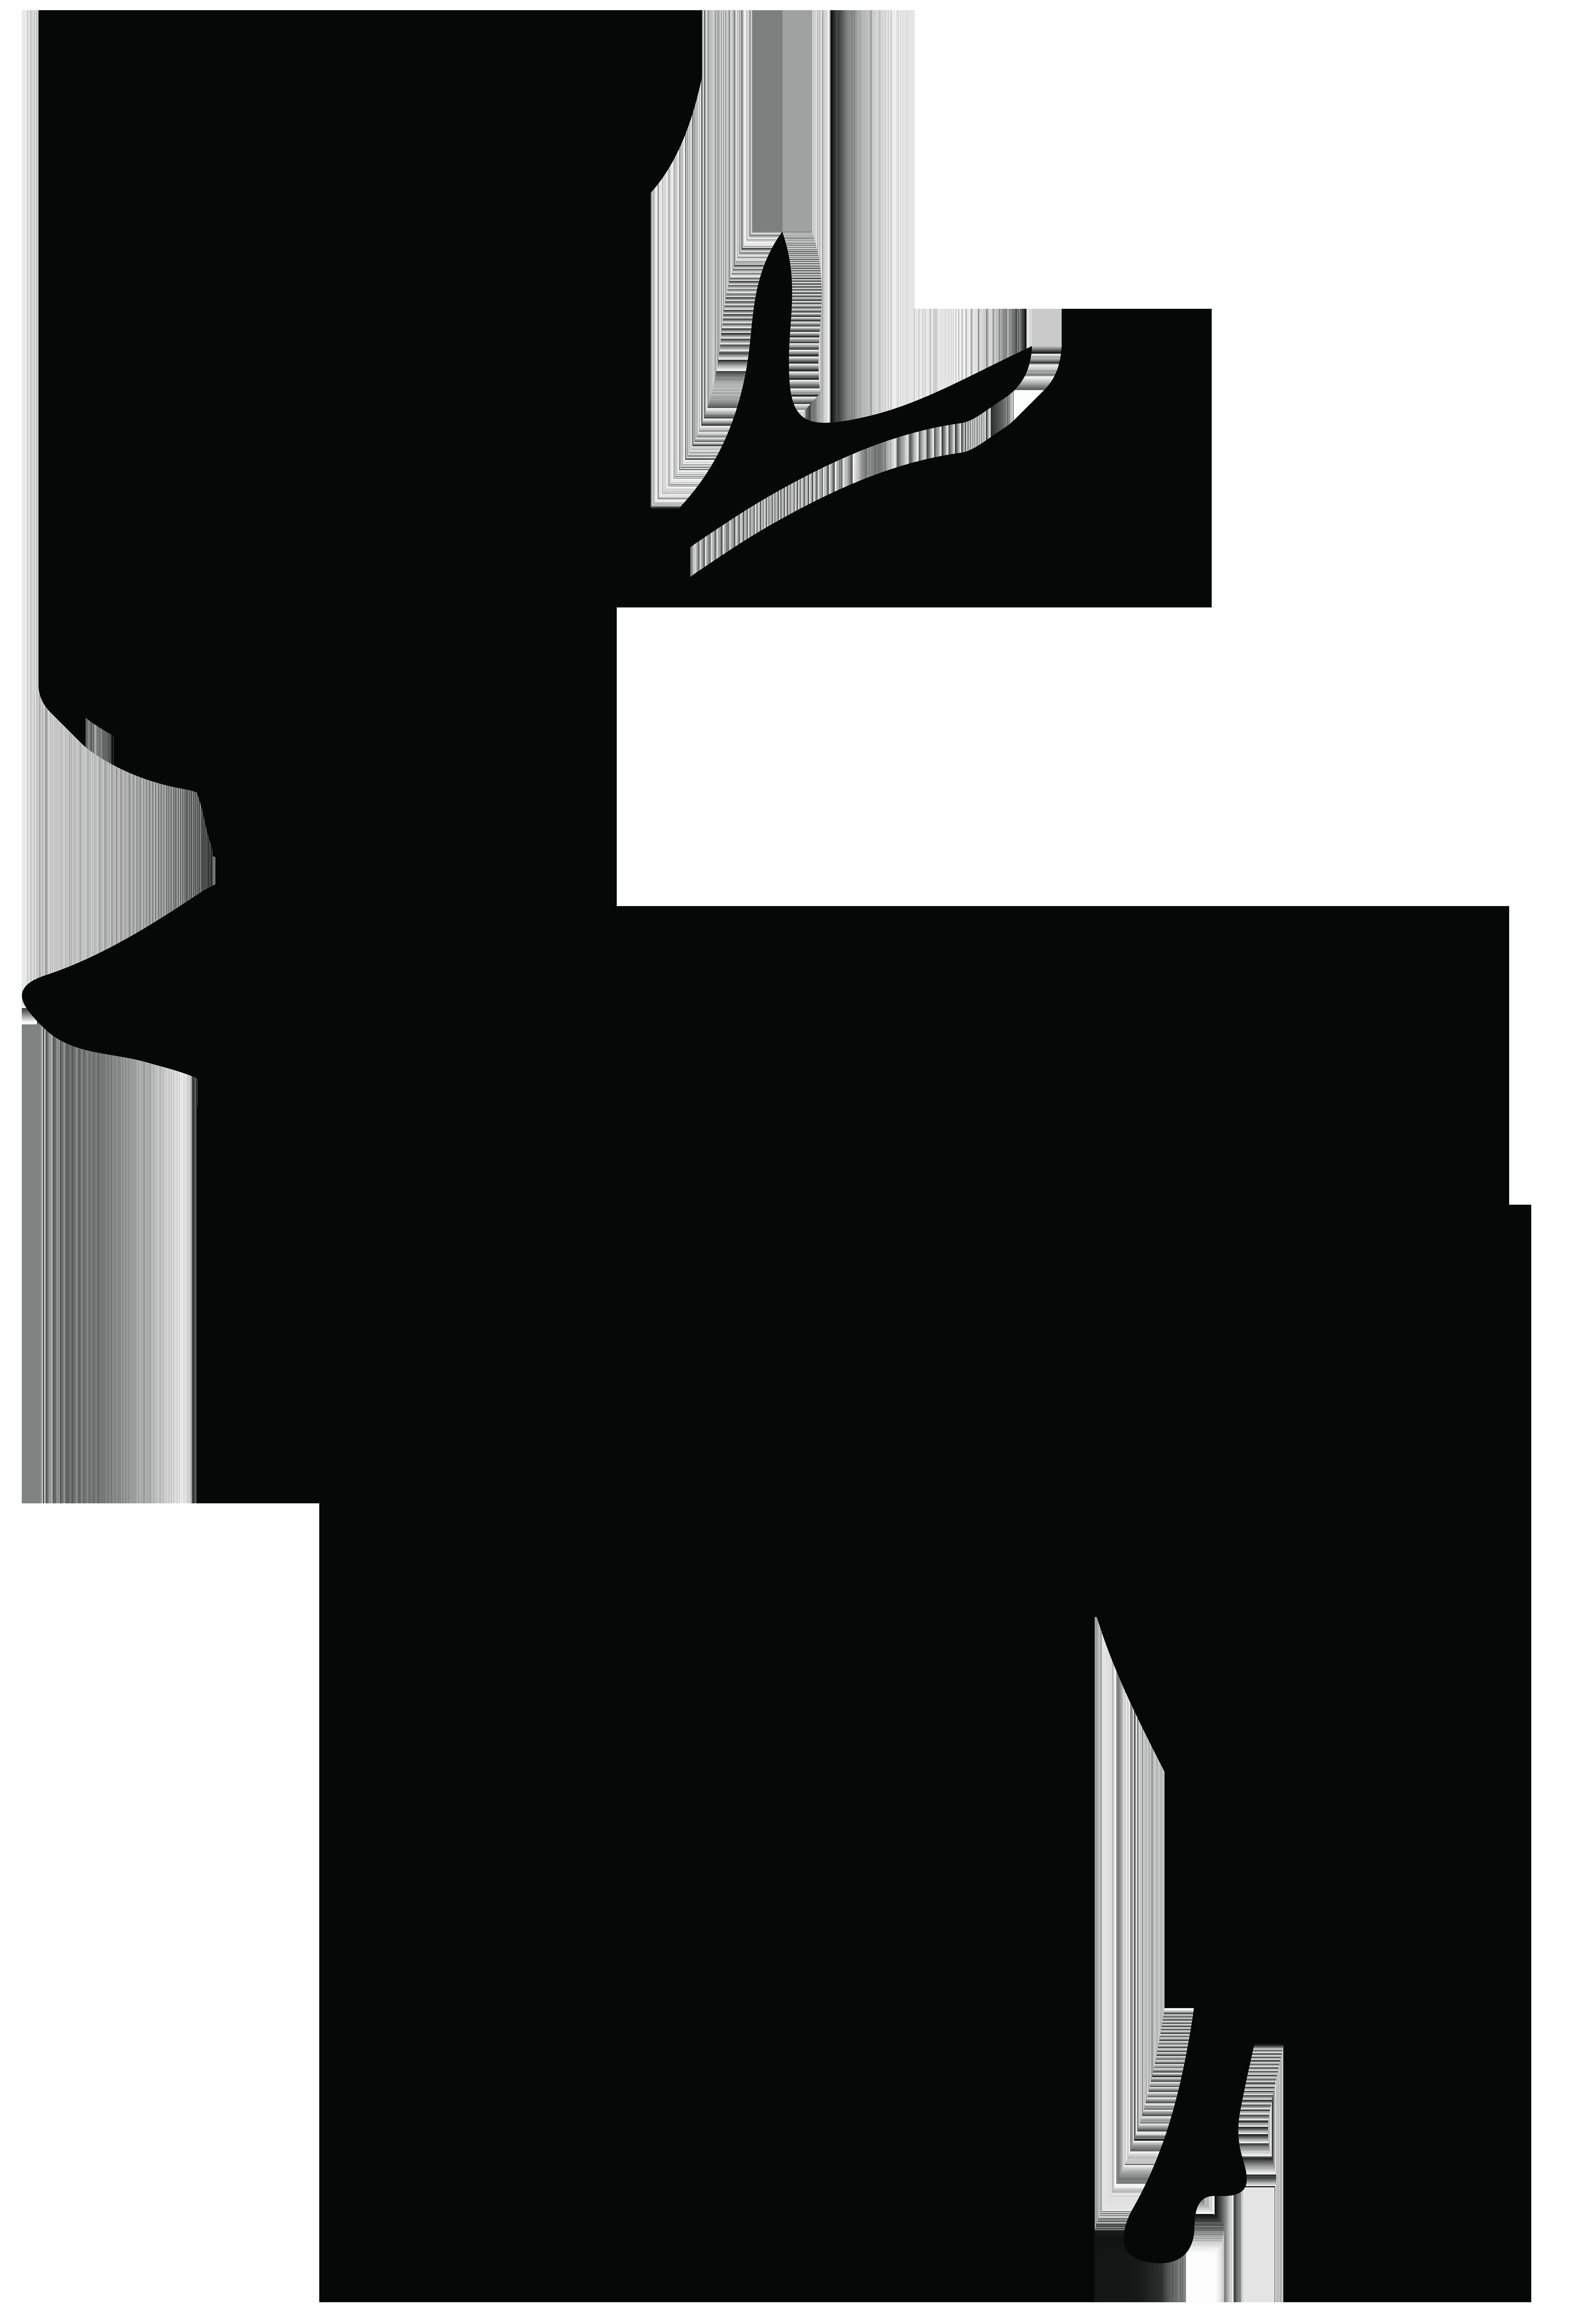 5487x8000 Silhouette Deer Clipart, Explore Pictures